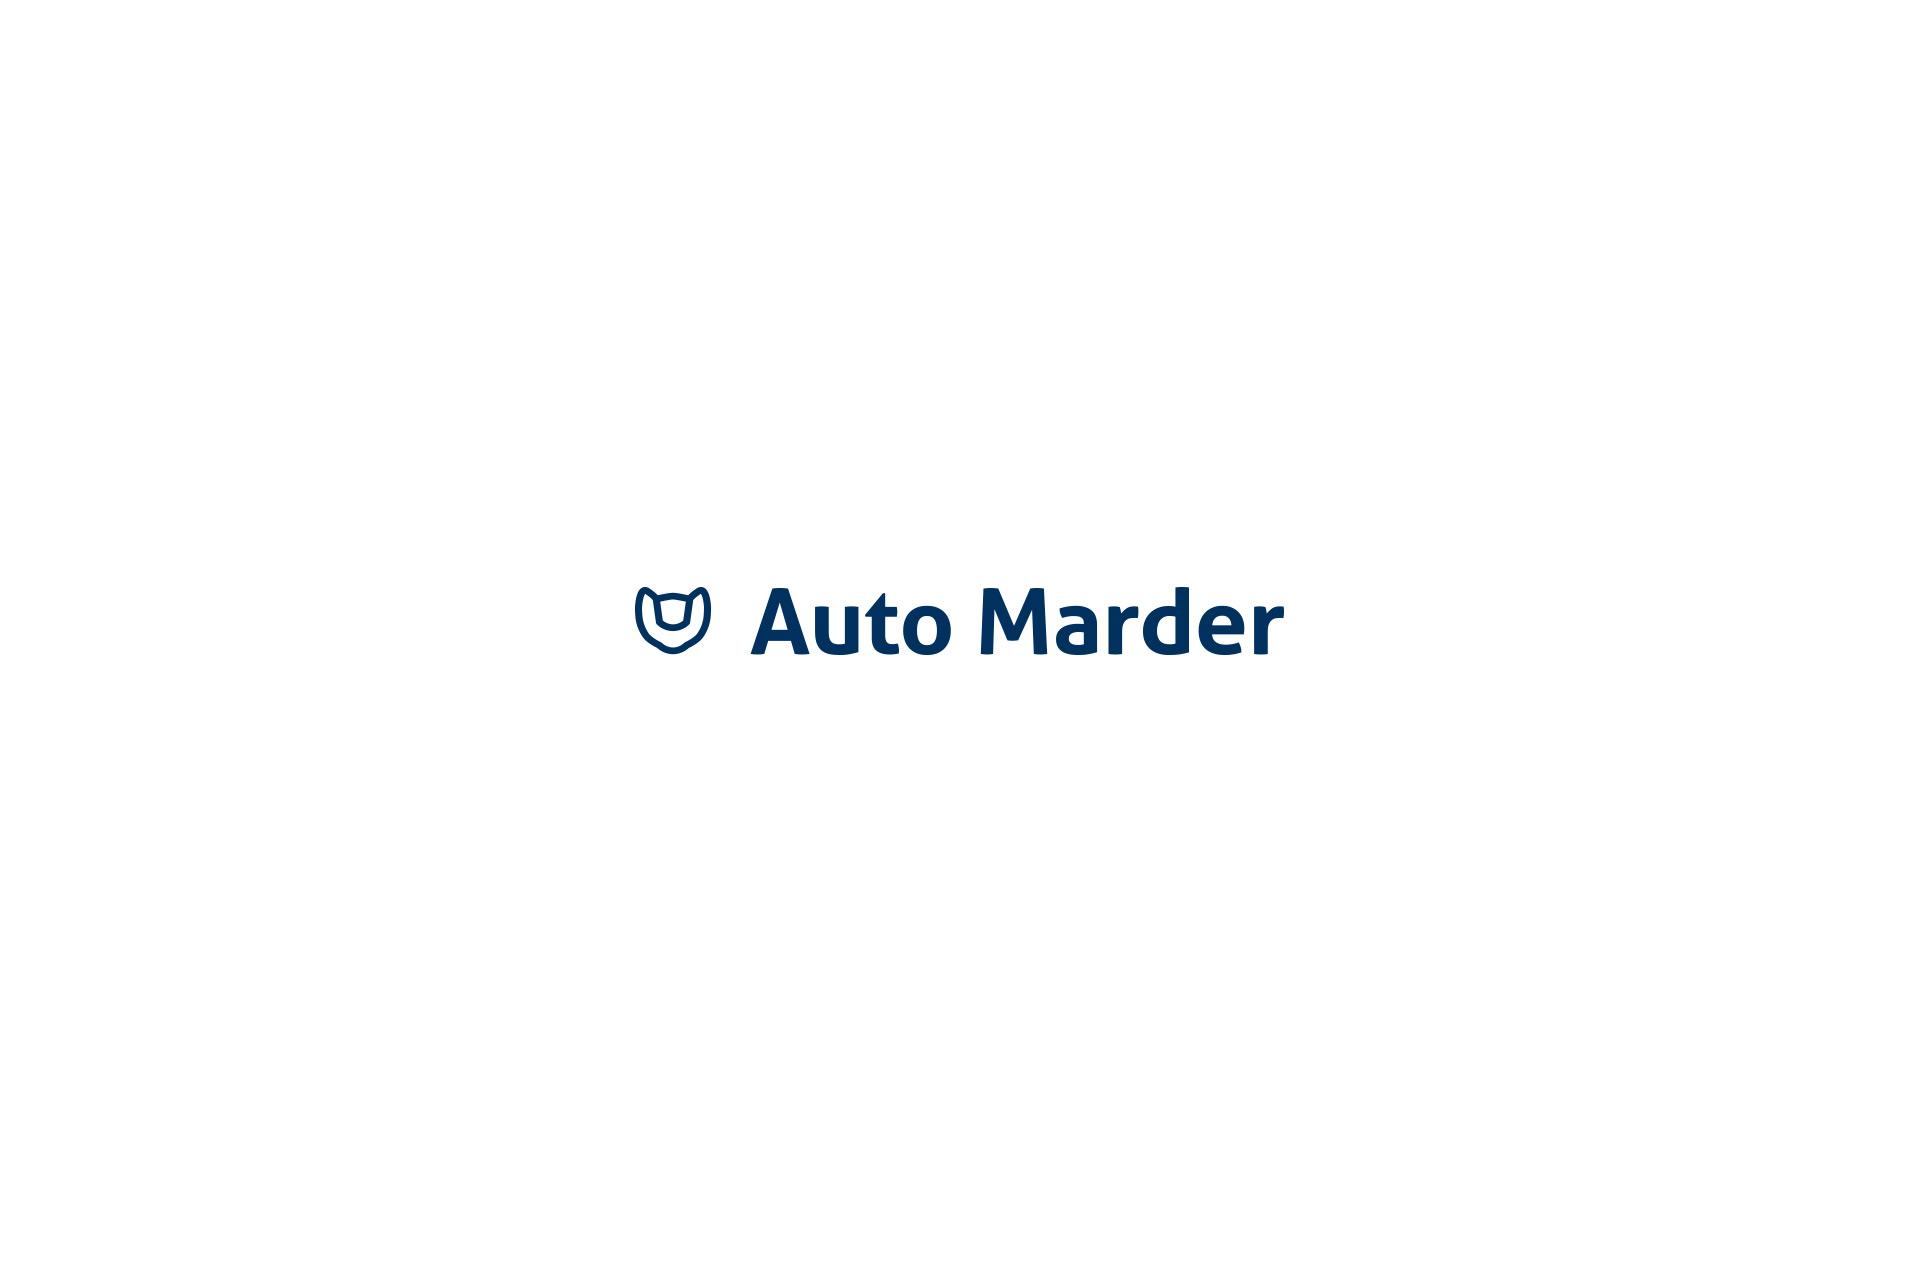 Auto Marder